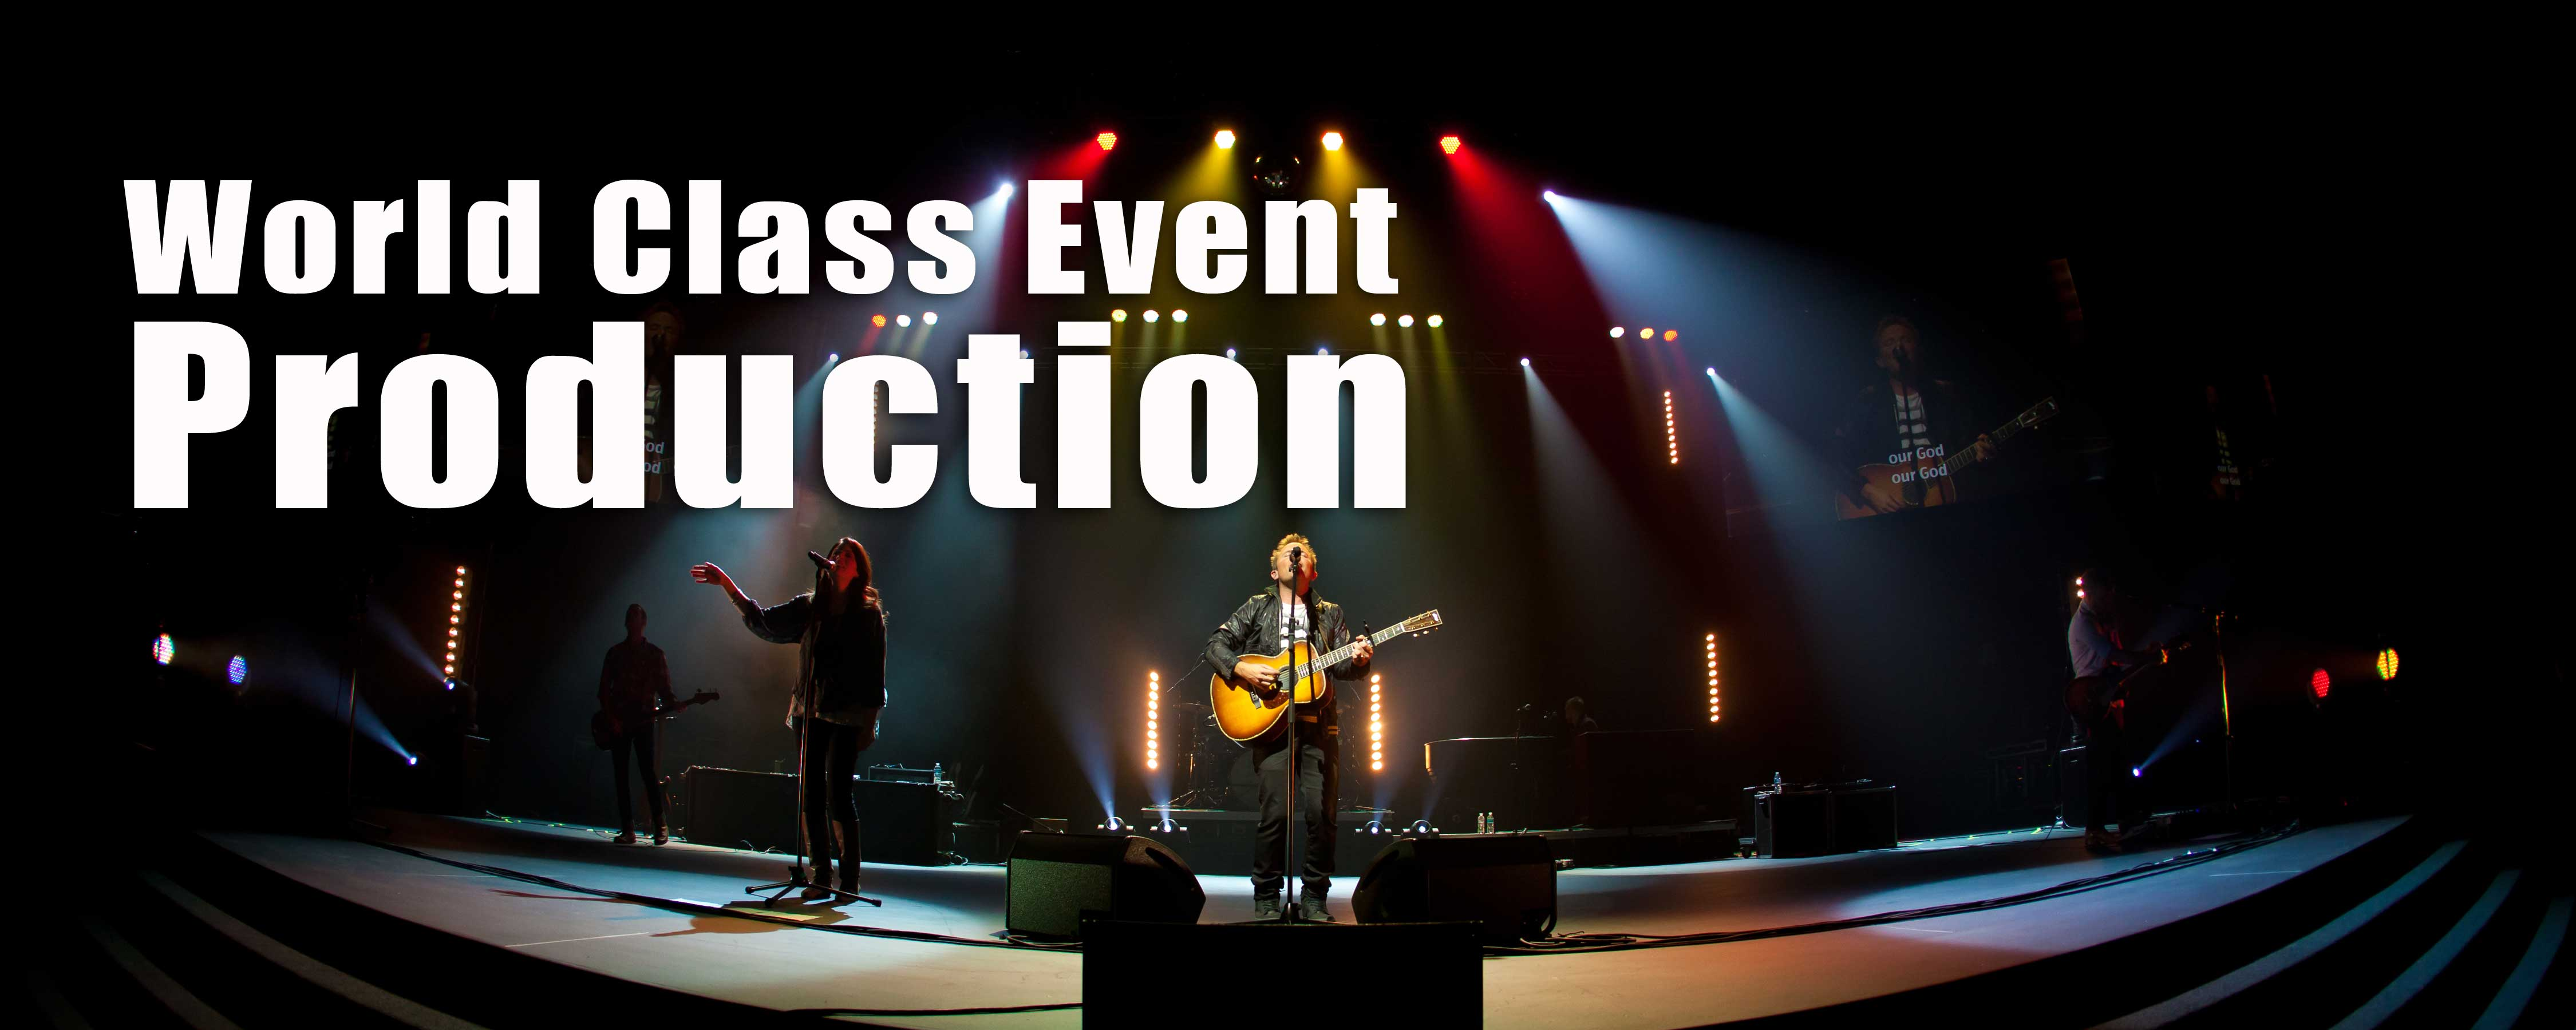 media-slides-MikeAllenPhoto-concerts